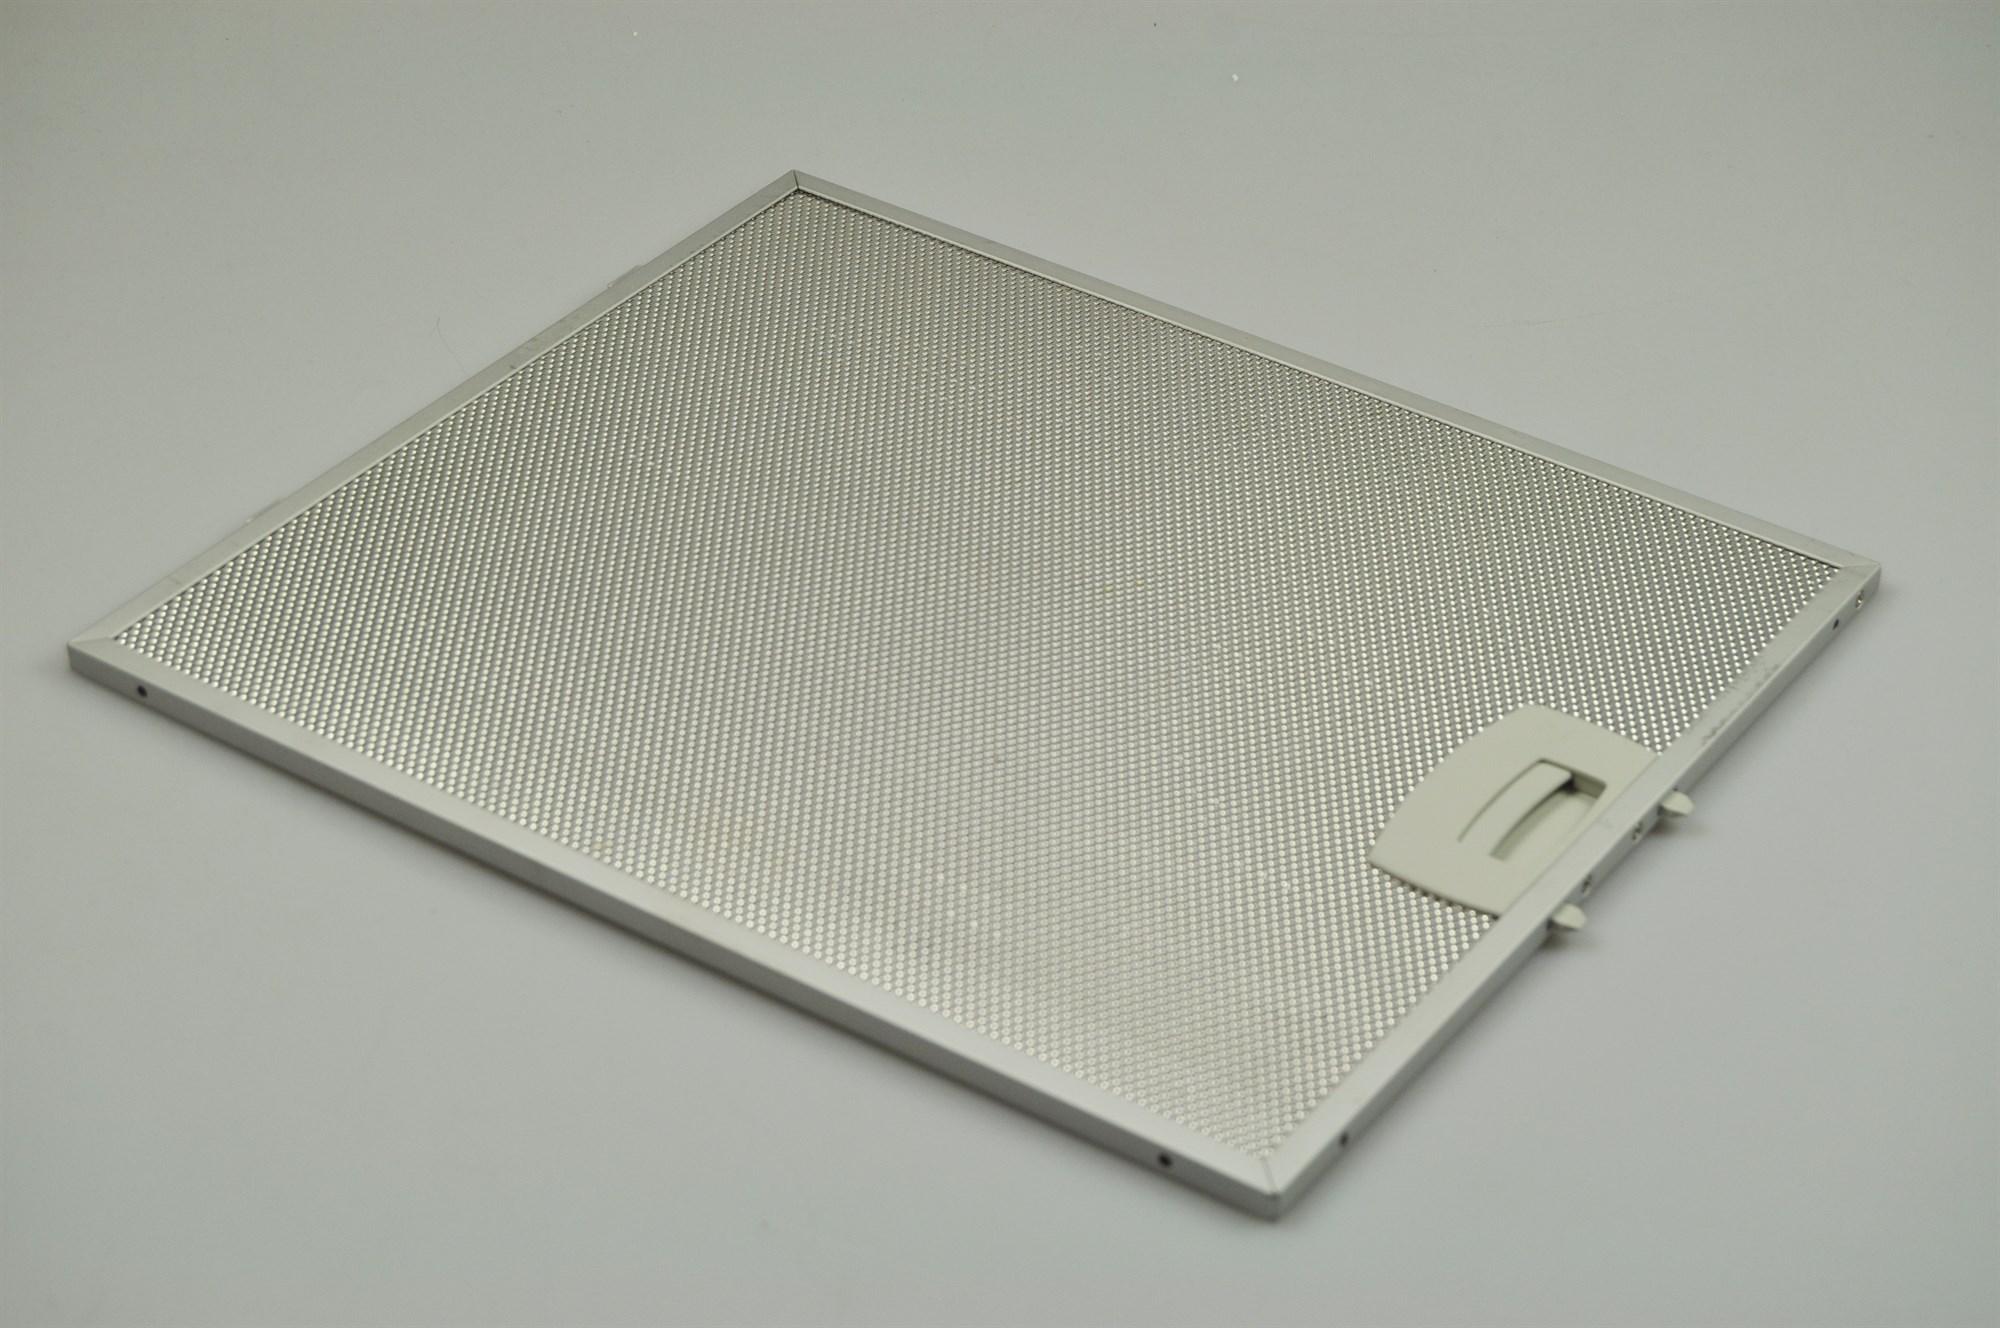 Metallfilter silverline dunstabzugshaube aluminium